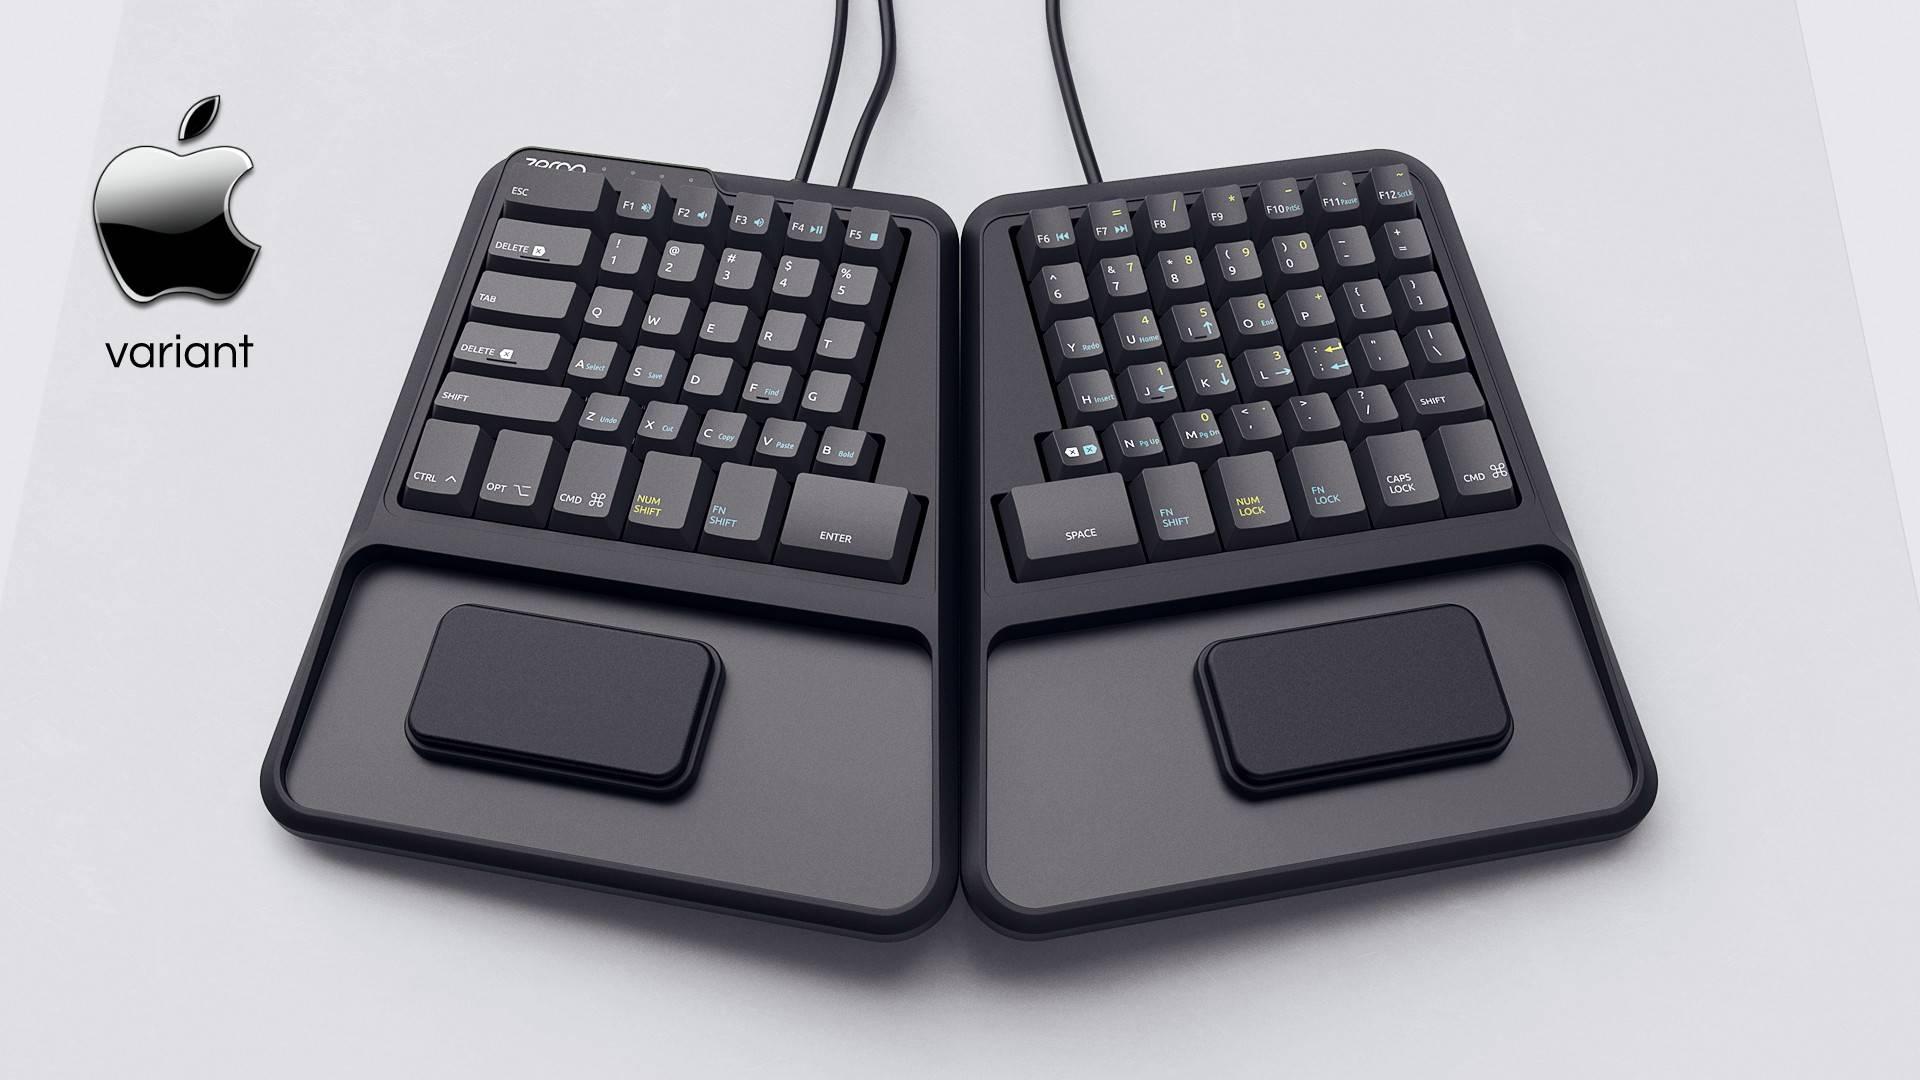 Zergotech Freedom top hero view mechanical keyboard ergonomic